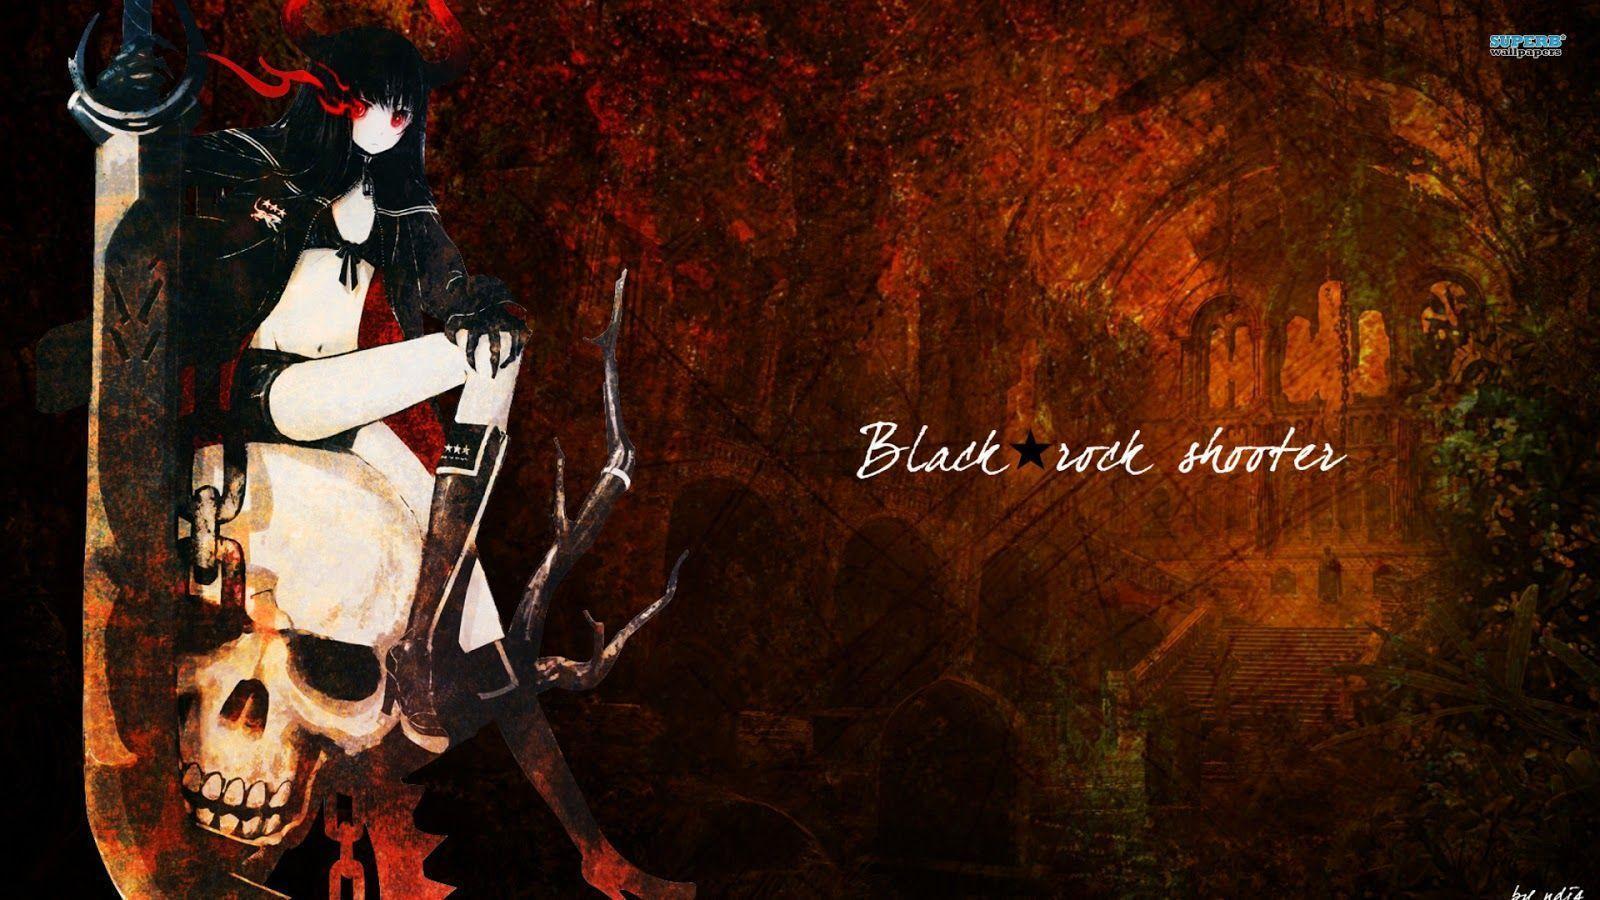 Epic anime wallpapers wallpapersafari - Anime backgrounds com ...